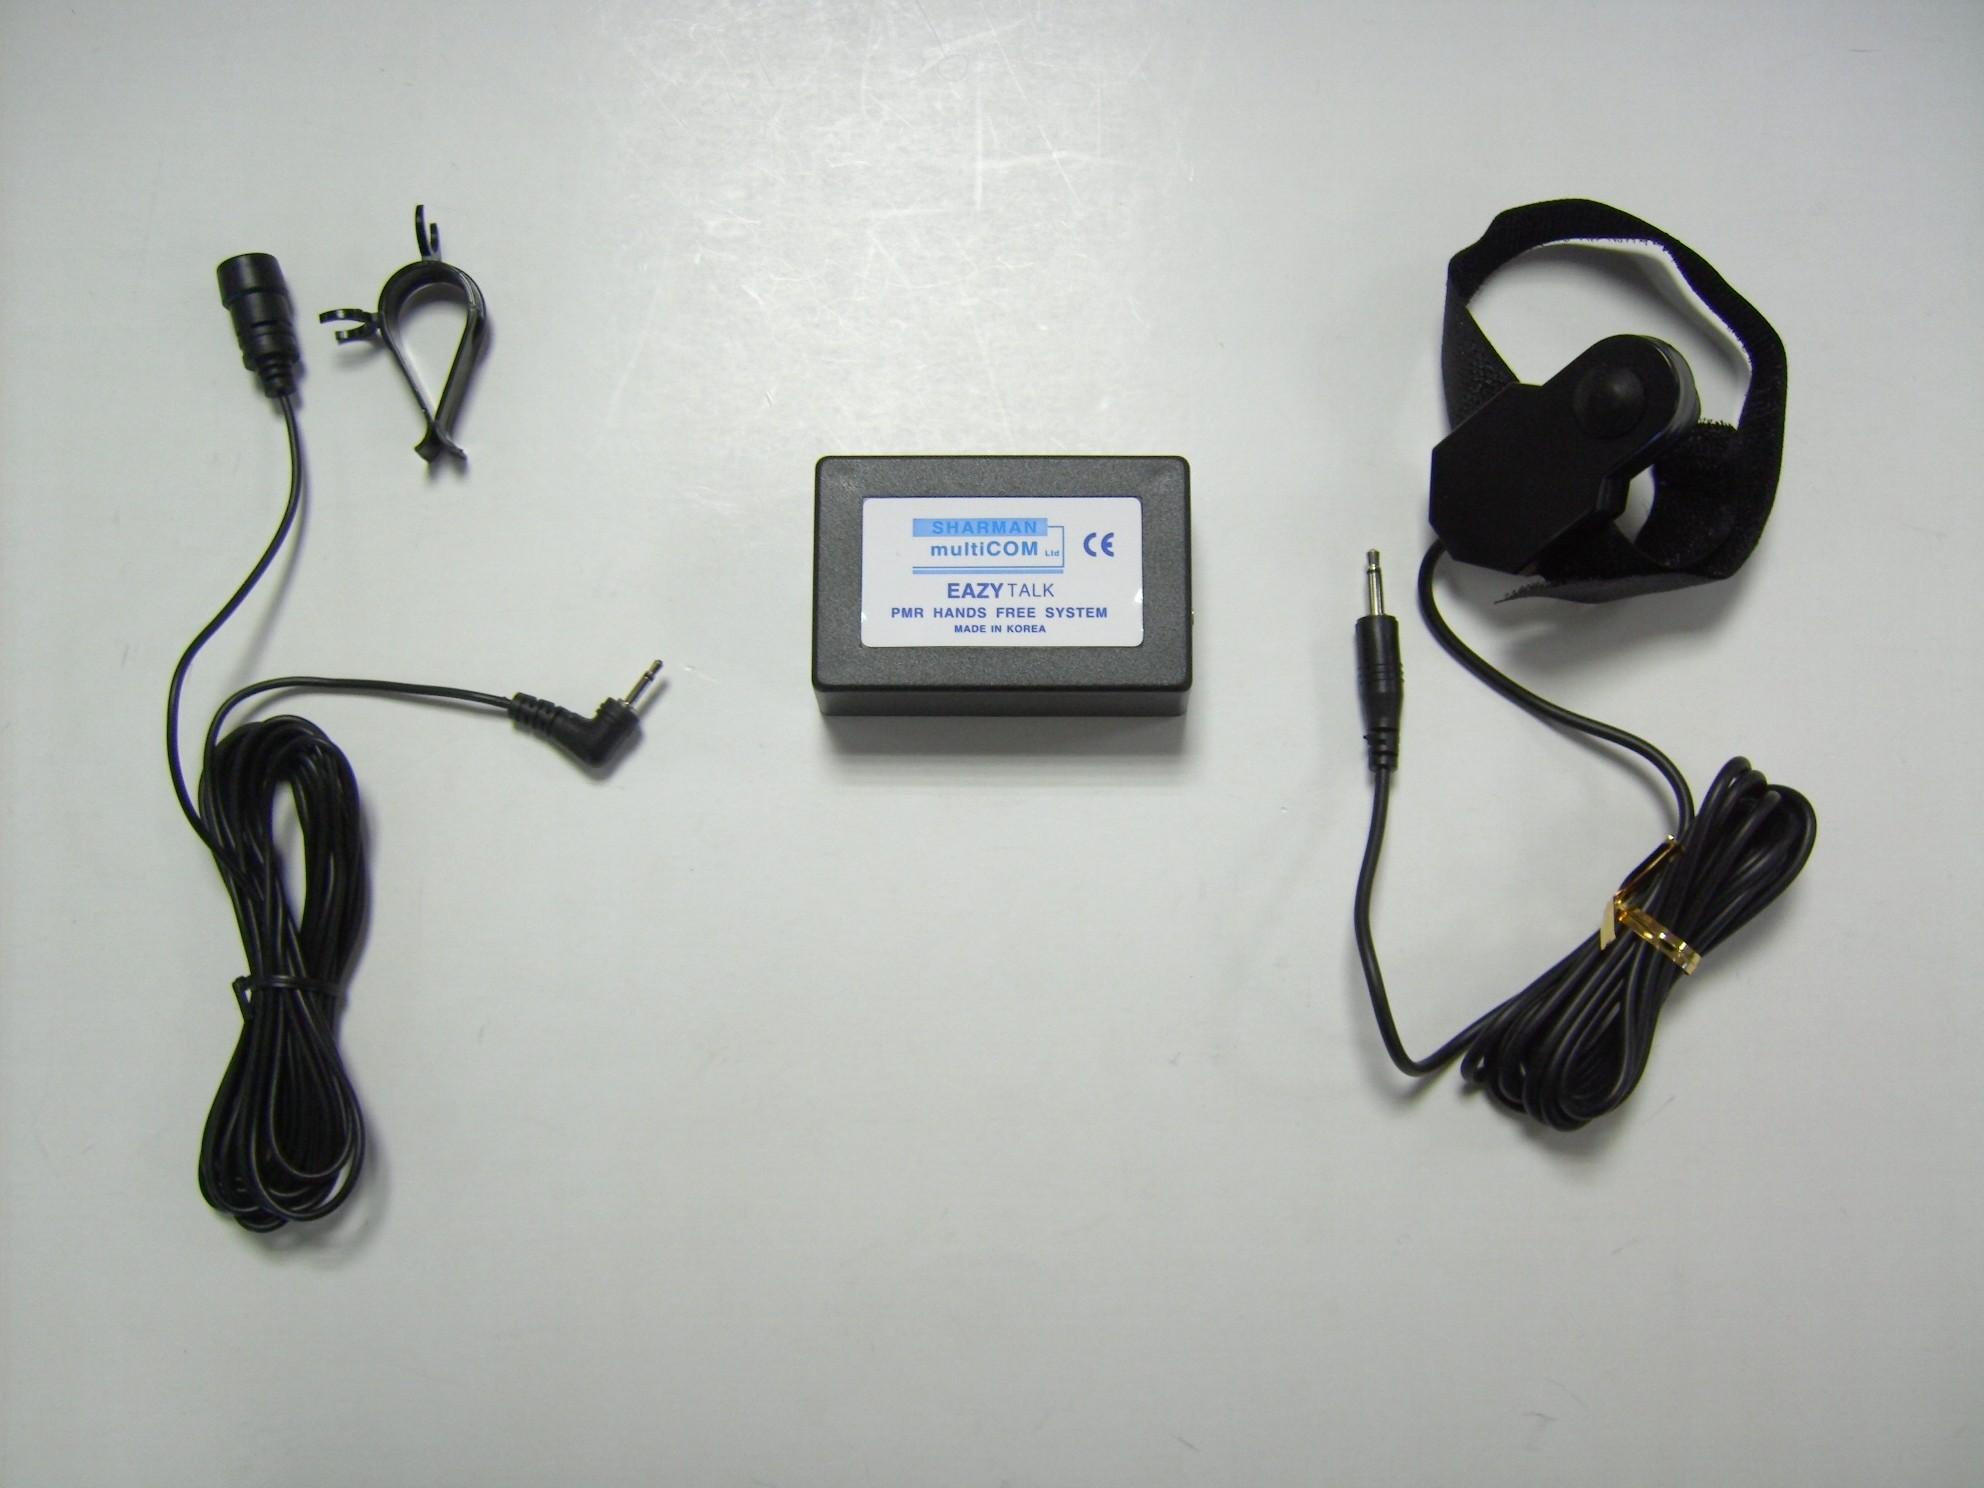 Eazytalk PMR Hands-free System Gear stick Mounted PTT